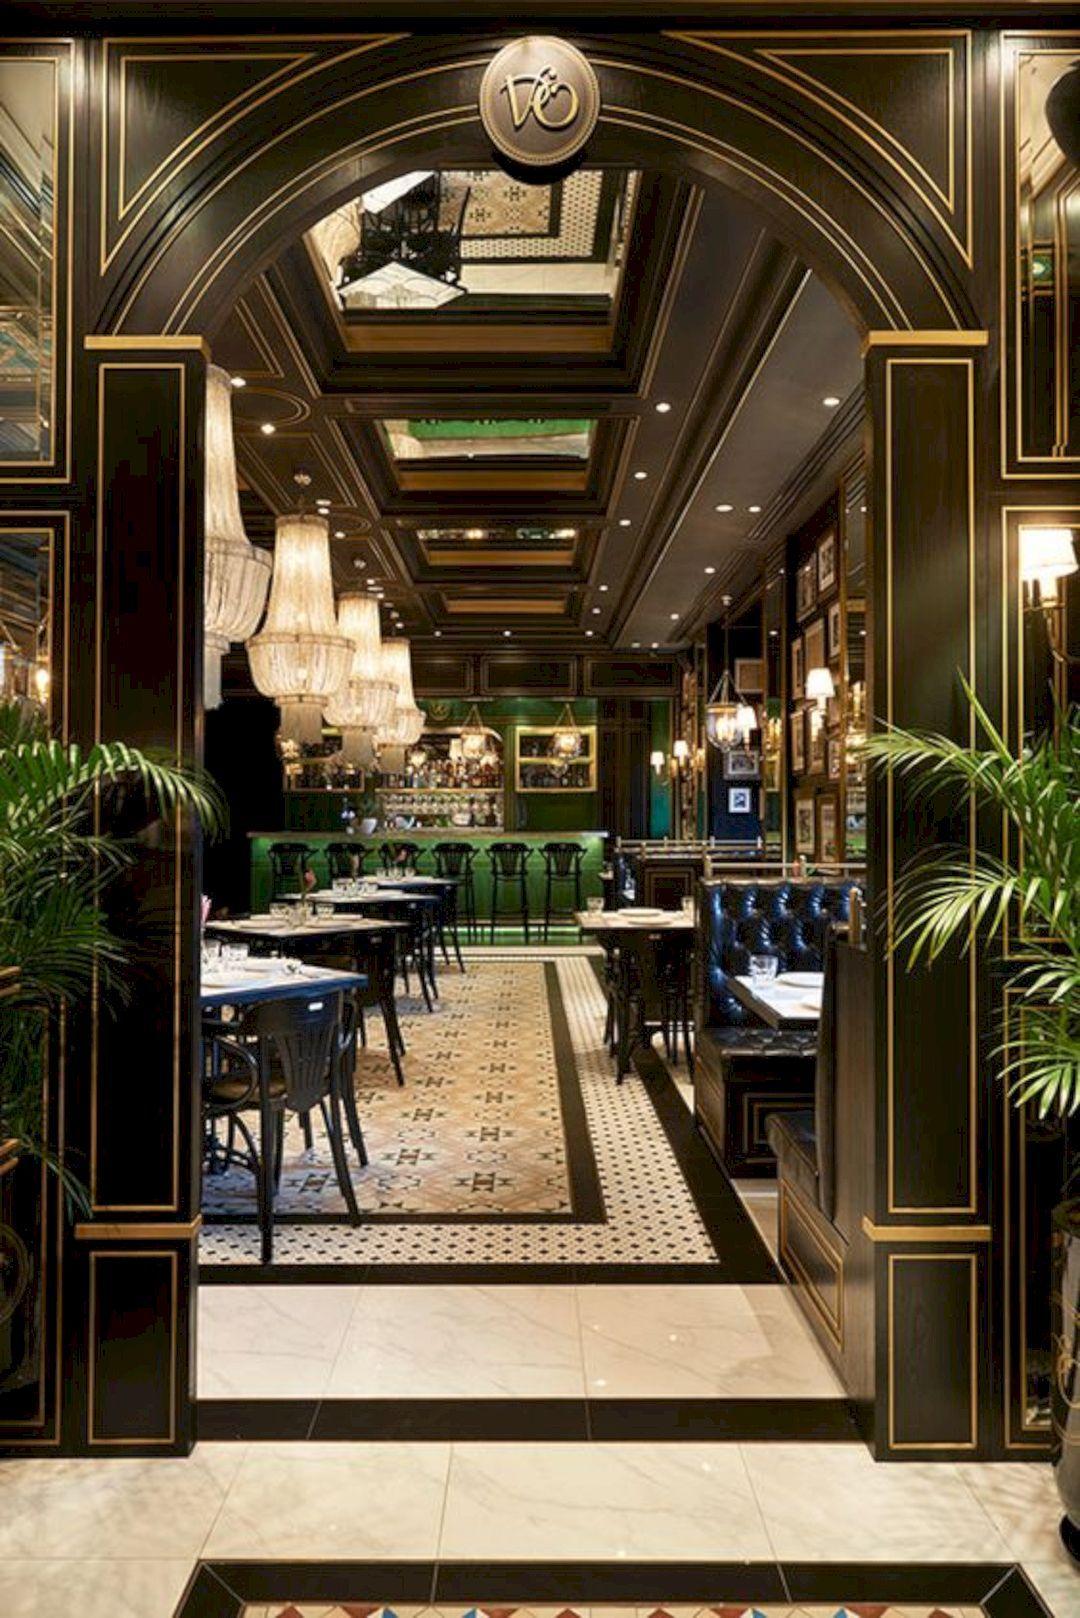 15 Great Interior Design Ideas For Small Restaurant Luxury